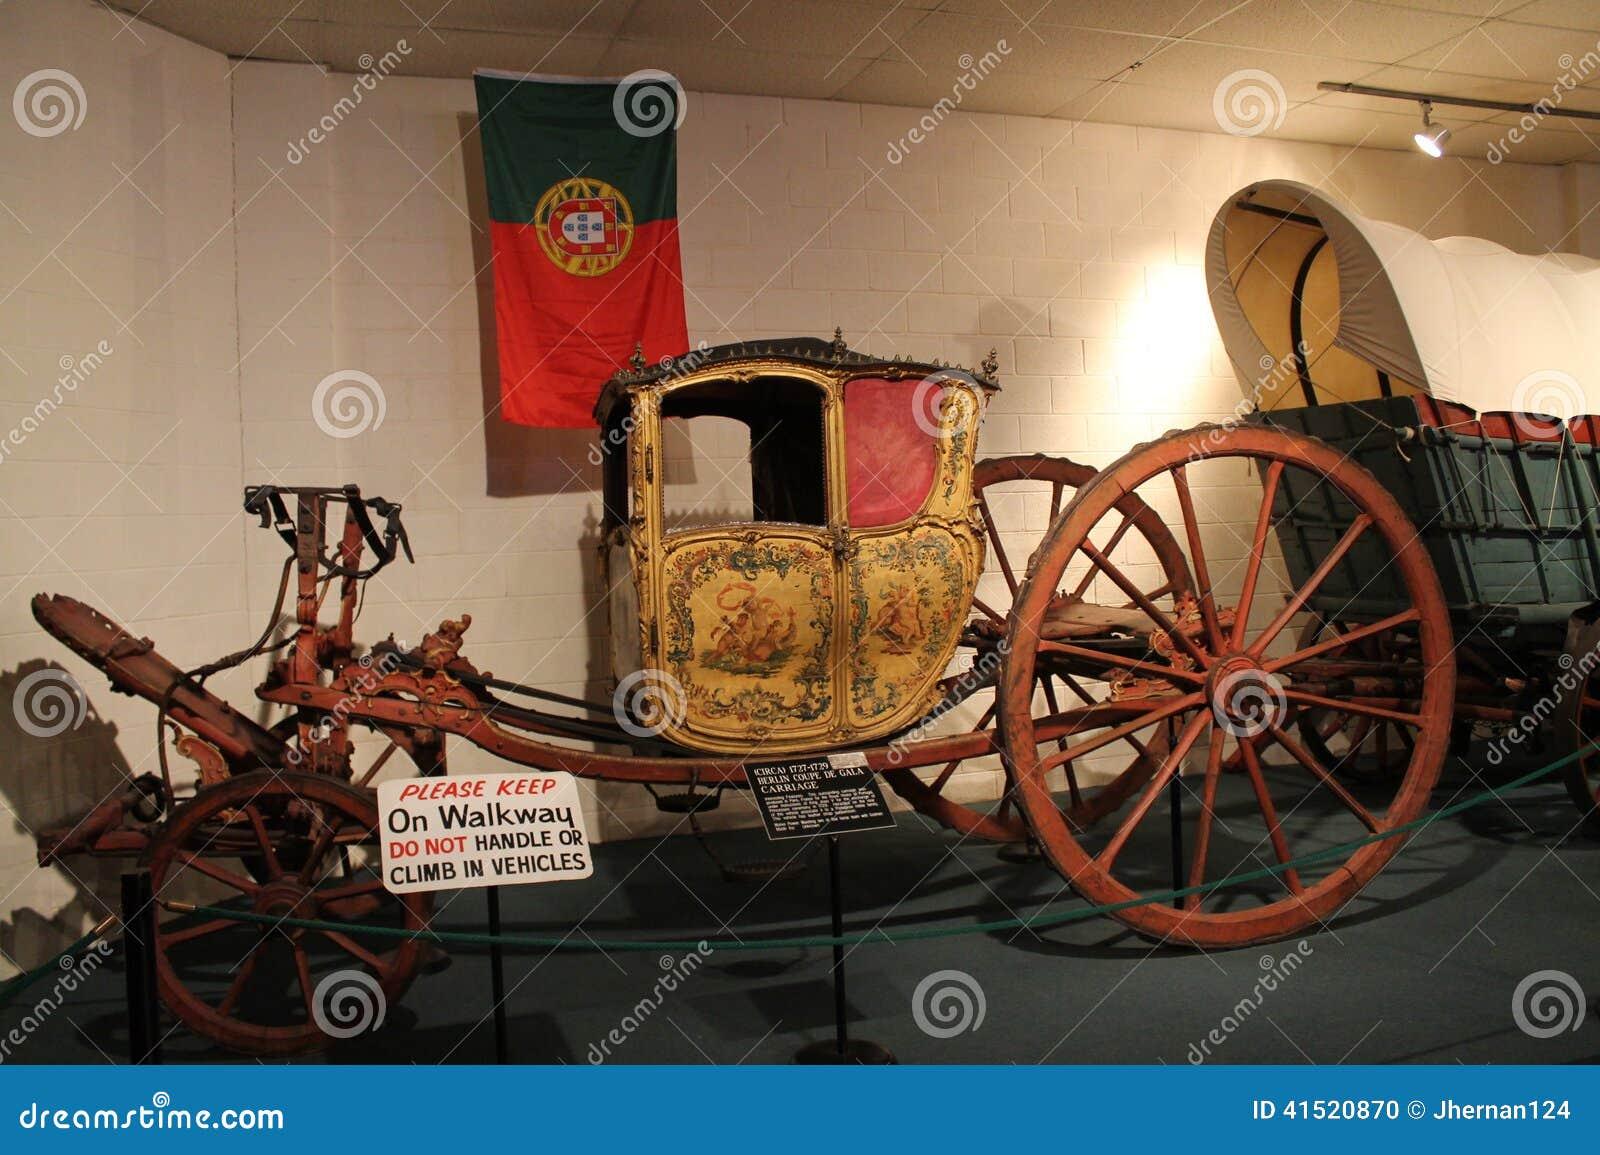 old royal carriage editorial image image 41520870. Black Bedroom Furniture Sets. Home Design Ideas